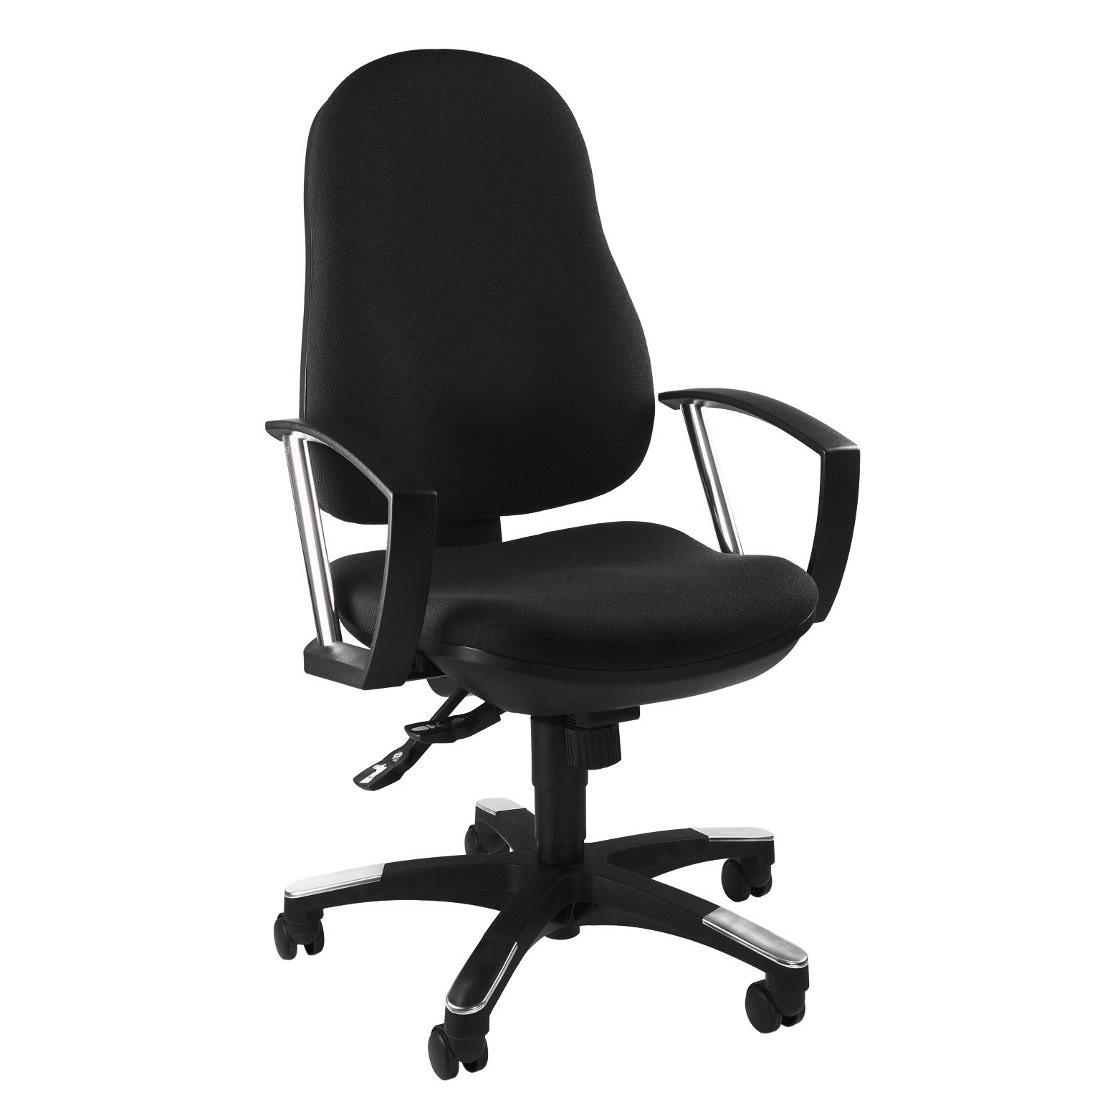 home24 Trend 10 Drehstuhl   Büro > Bürostühle und Sessel  > Bürostühle   Schwarz   Topstar